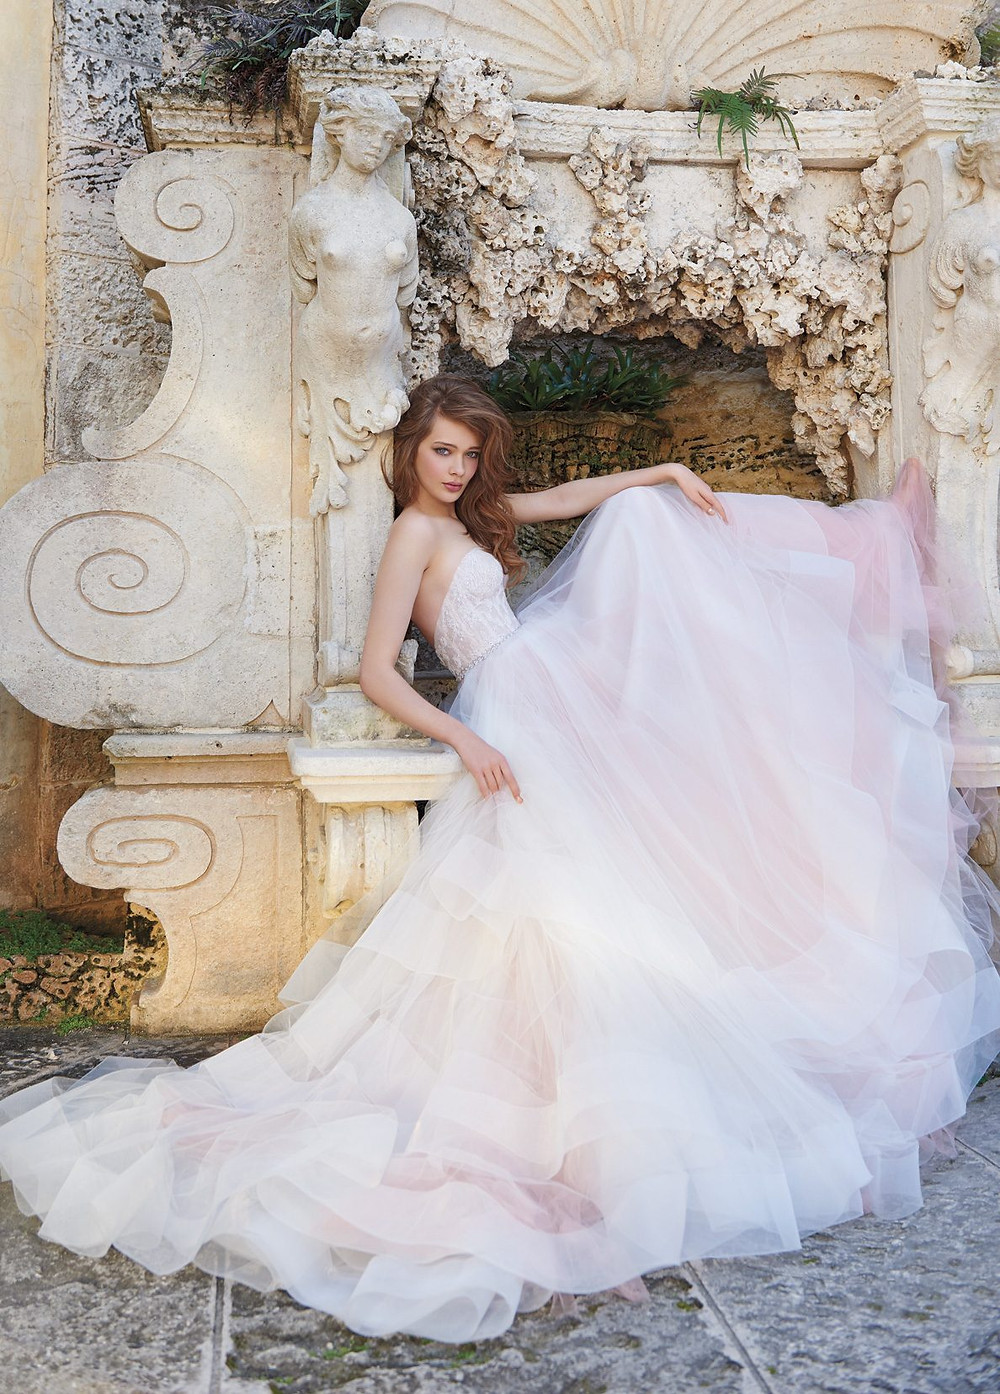 tara-keely-bridal-tulle-ball-gown-strapless-corset-crystal-belt-natural-waist-chapel-train-2510_lg